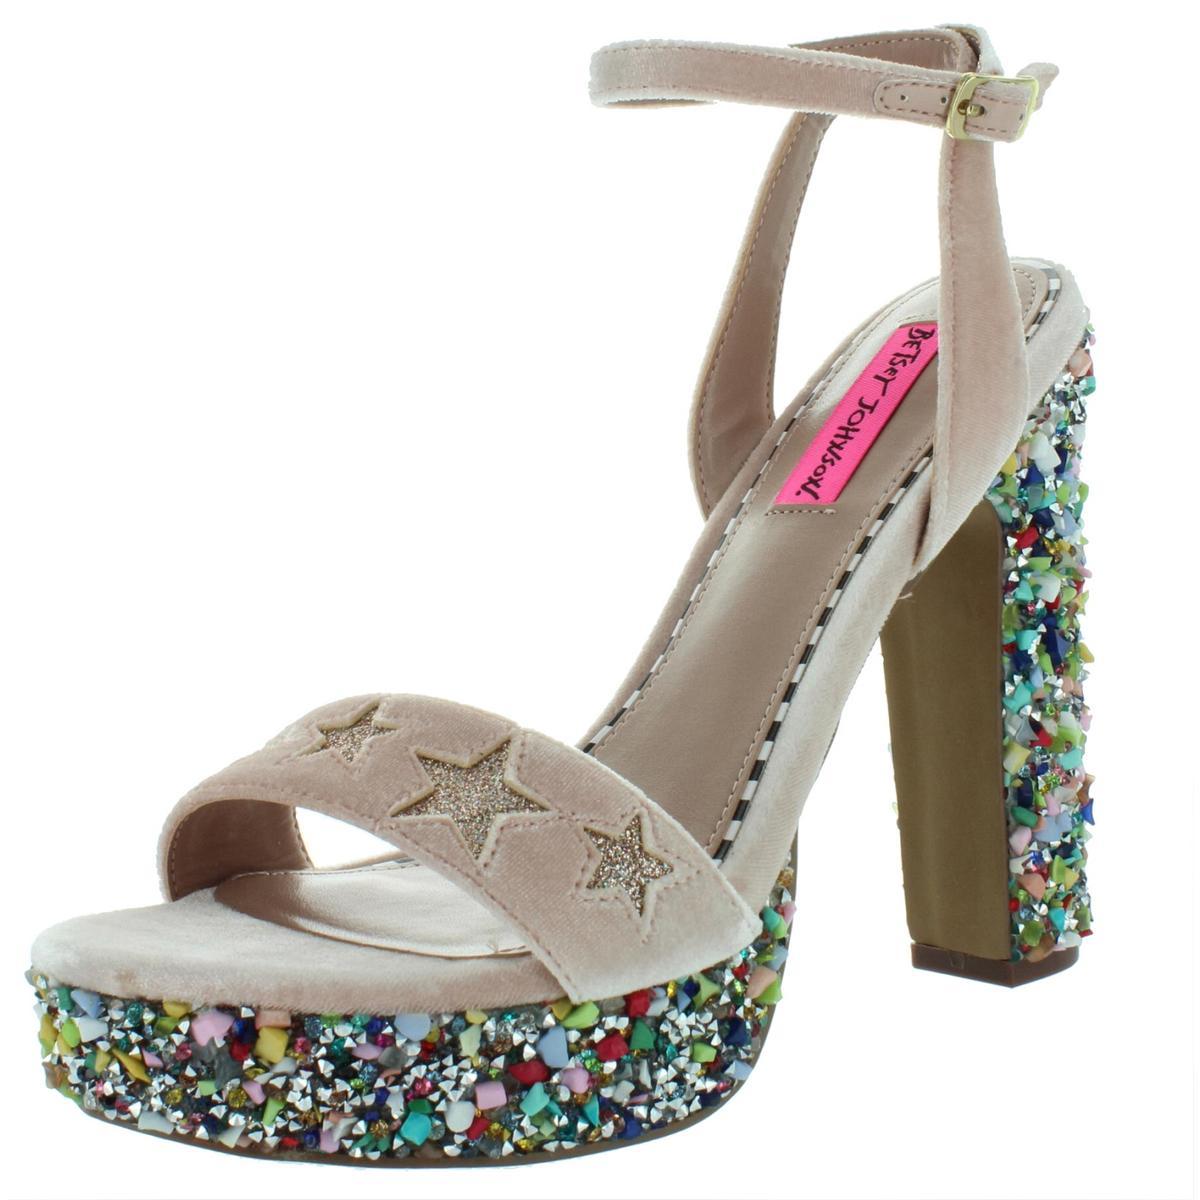 ee28946a27 Details about Betsey Johnson Womens Kenna Pink Platform Sandals Shoes 9  Medium (B,M) BHFO 6359